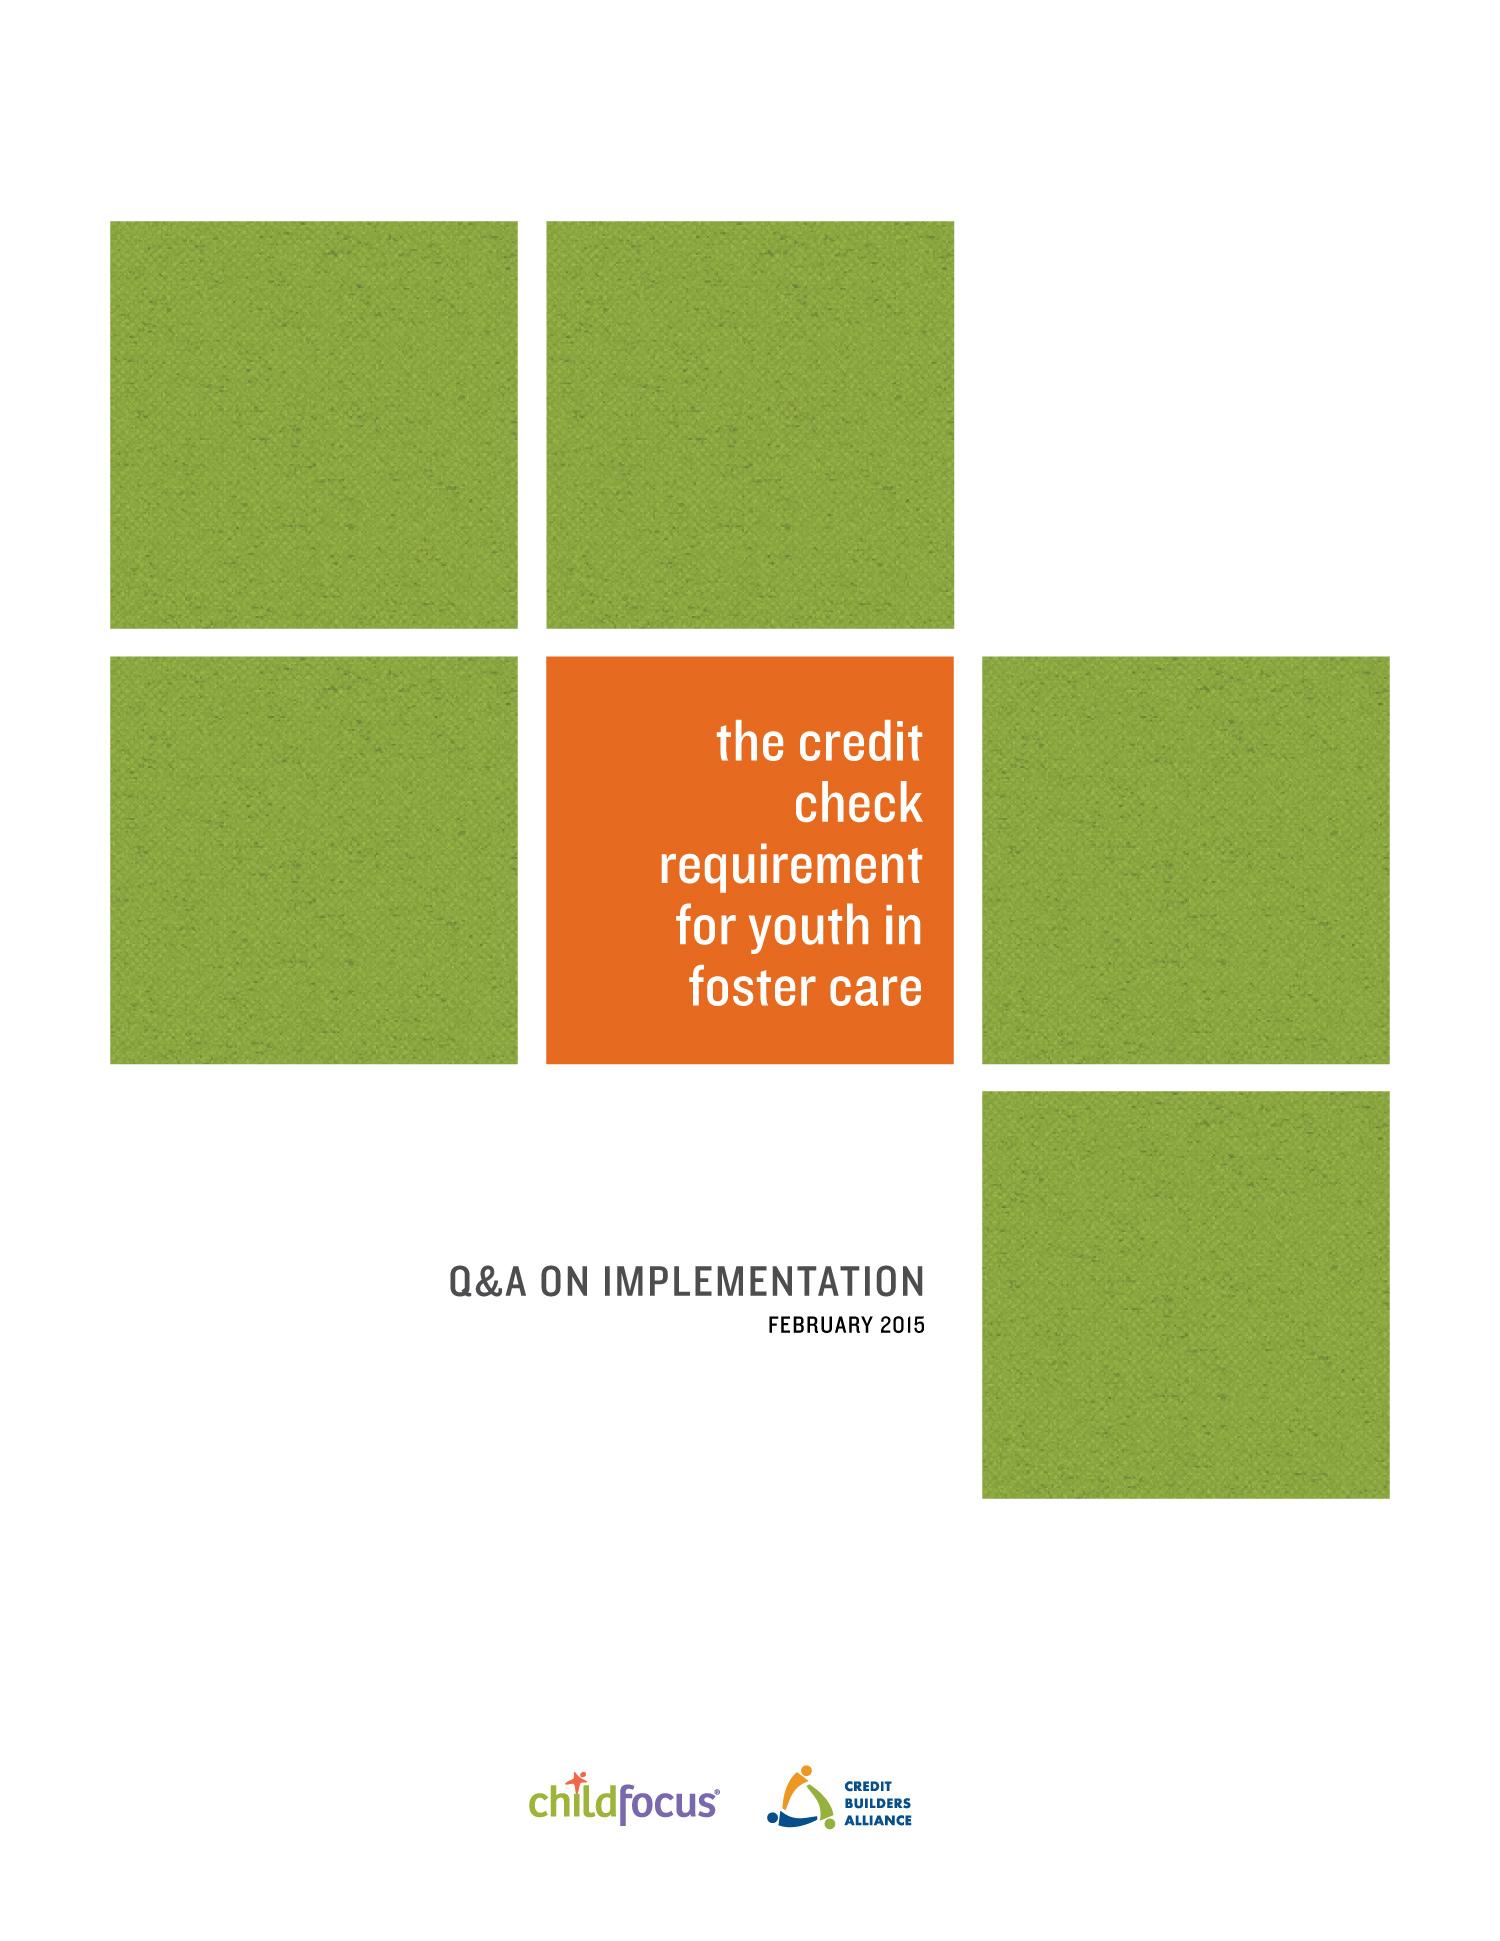 YouthCreditCheckToolkit-QA.jpg